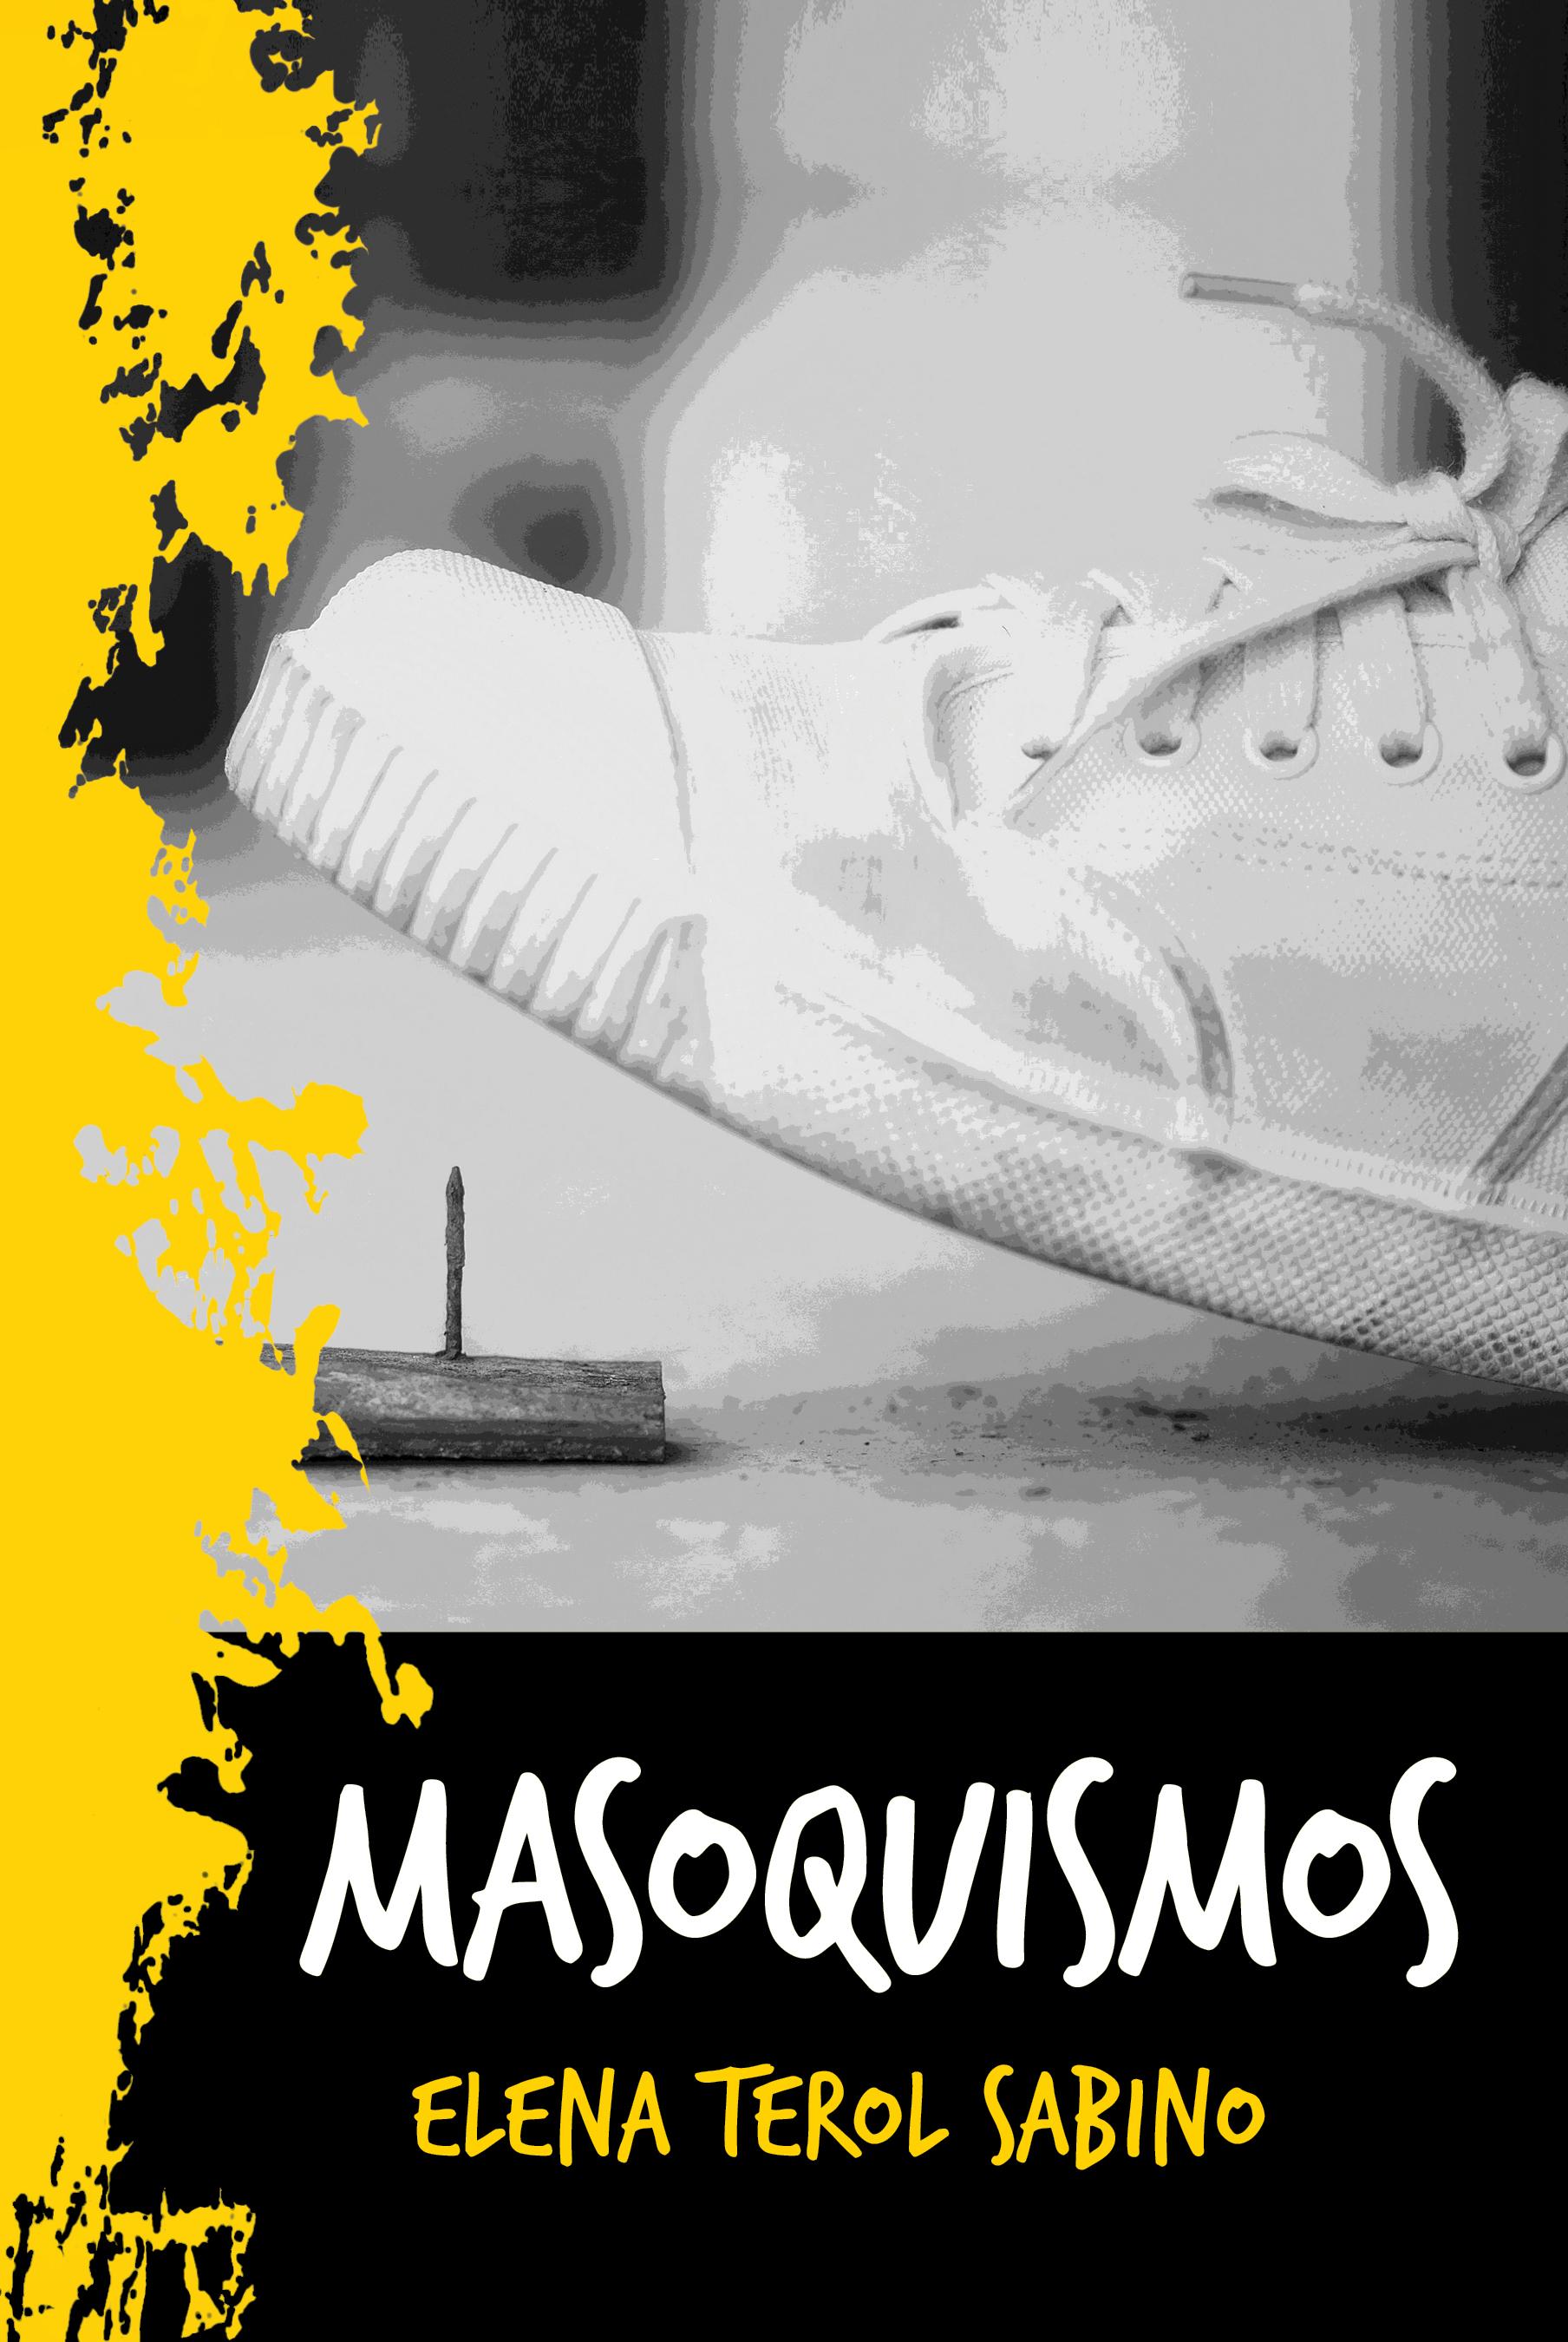 Masoquismos - sabino - spanish.jpg